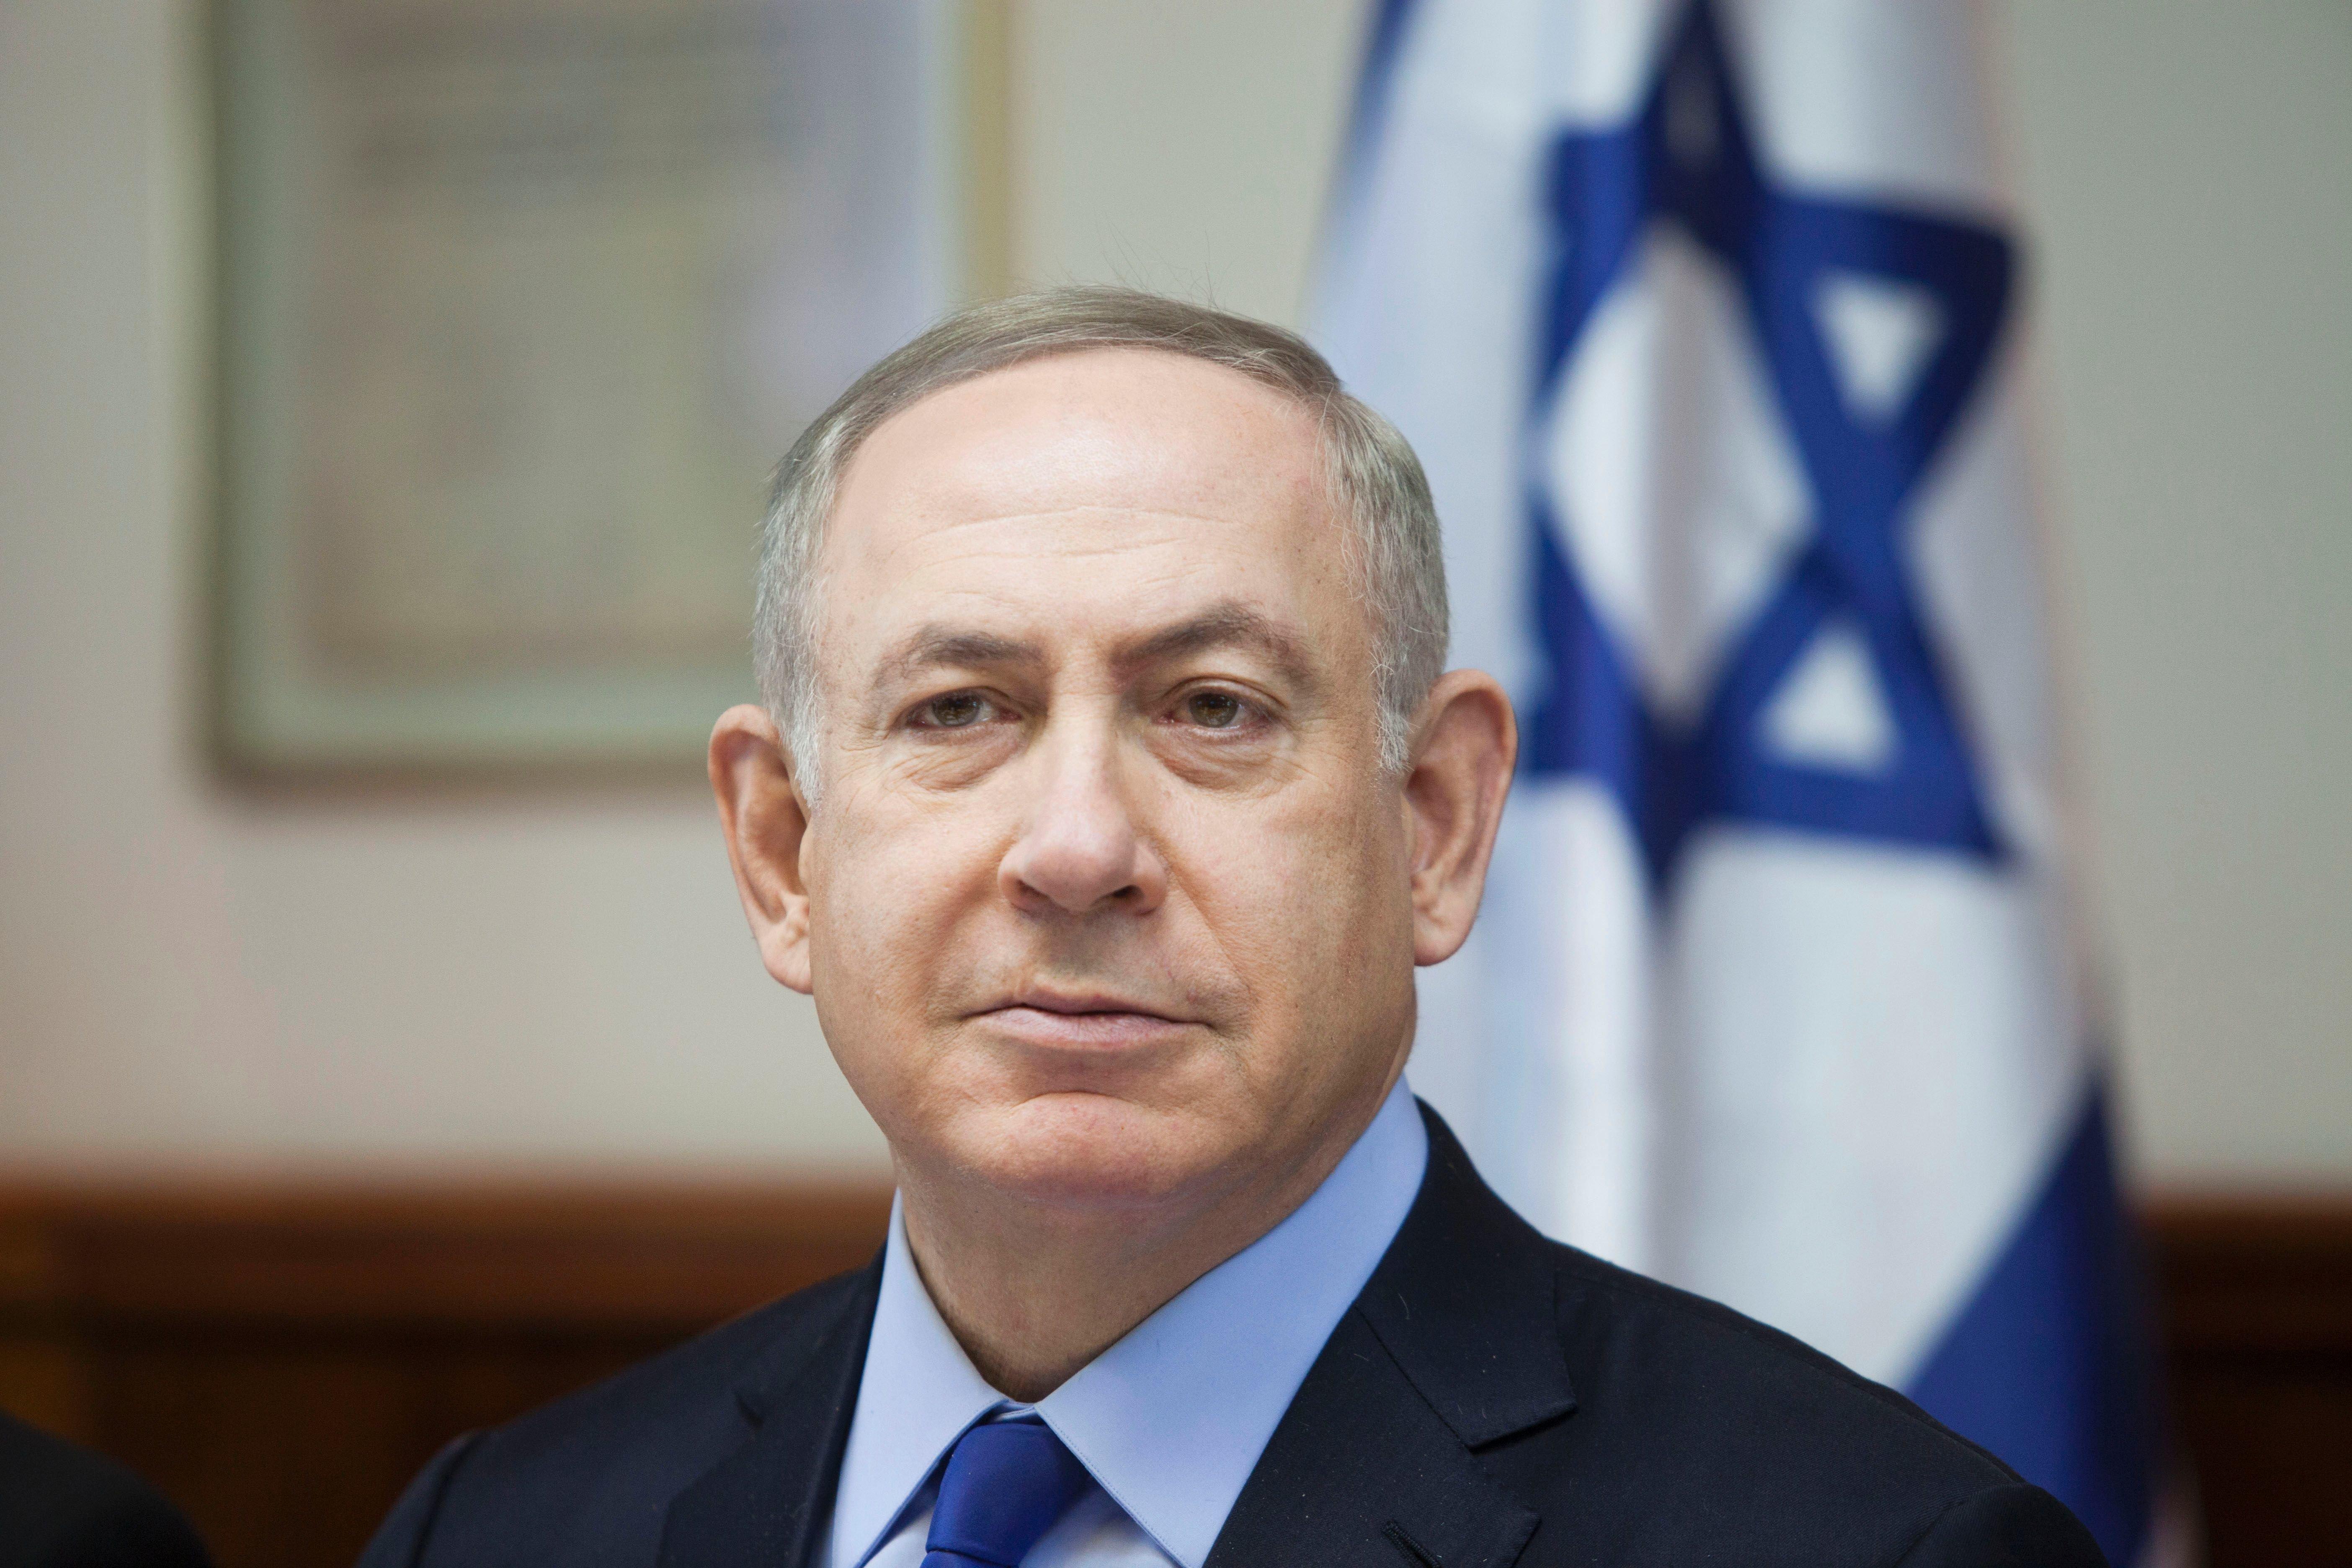 Israeli PM Netanyahu Summons U.S. Ambassador Over Anti-Settlement UN